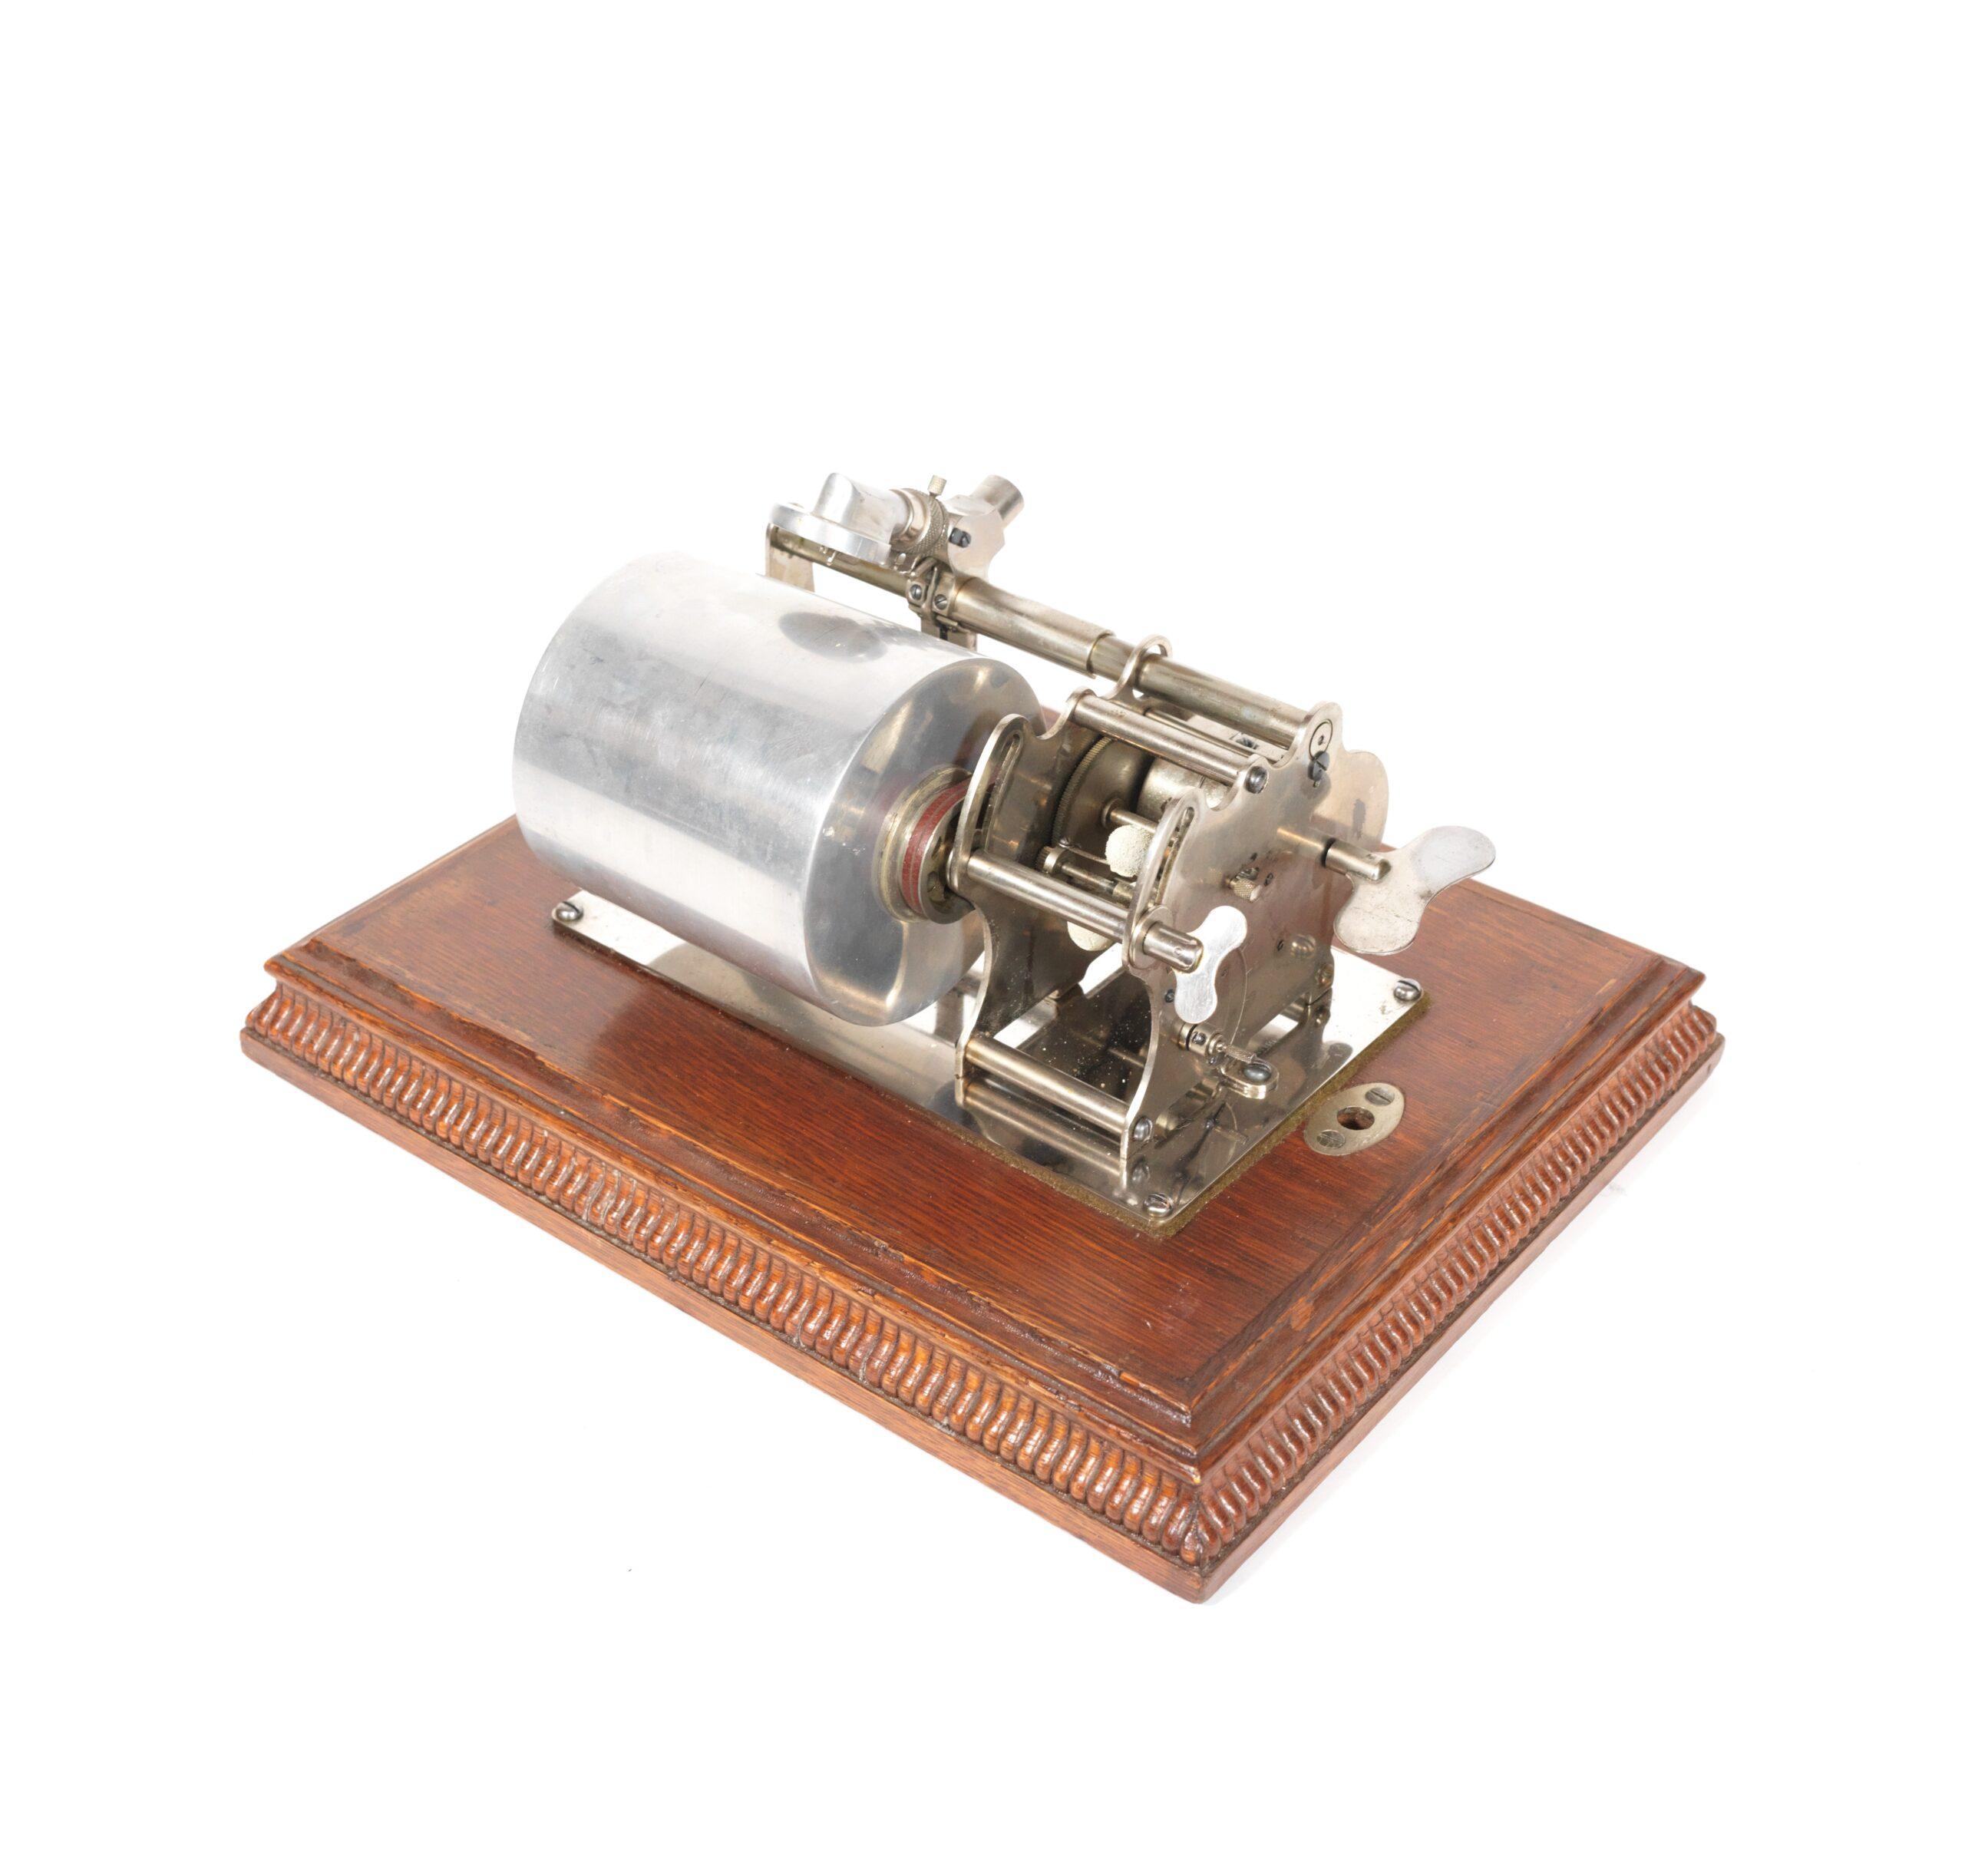 1901 Columbia AB MacDonald Grand Graphophone Cylinder Phonograph